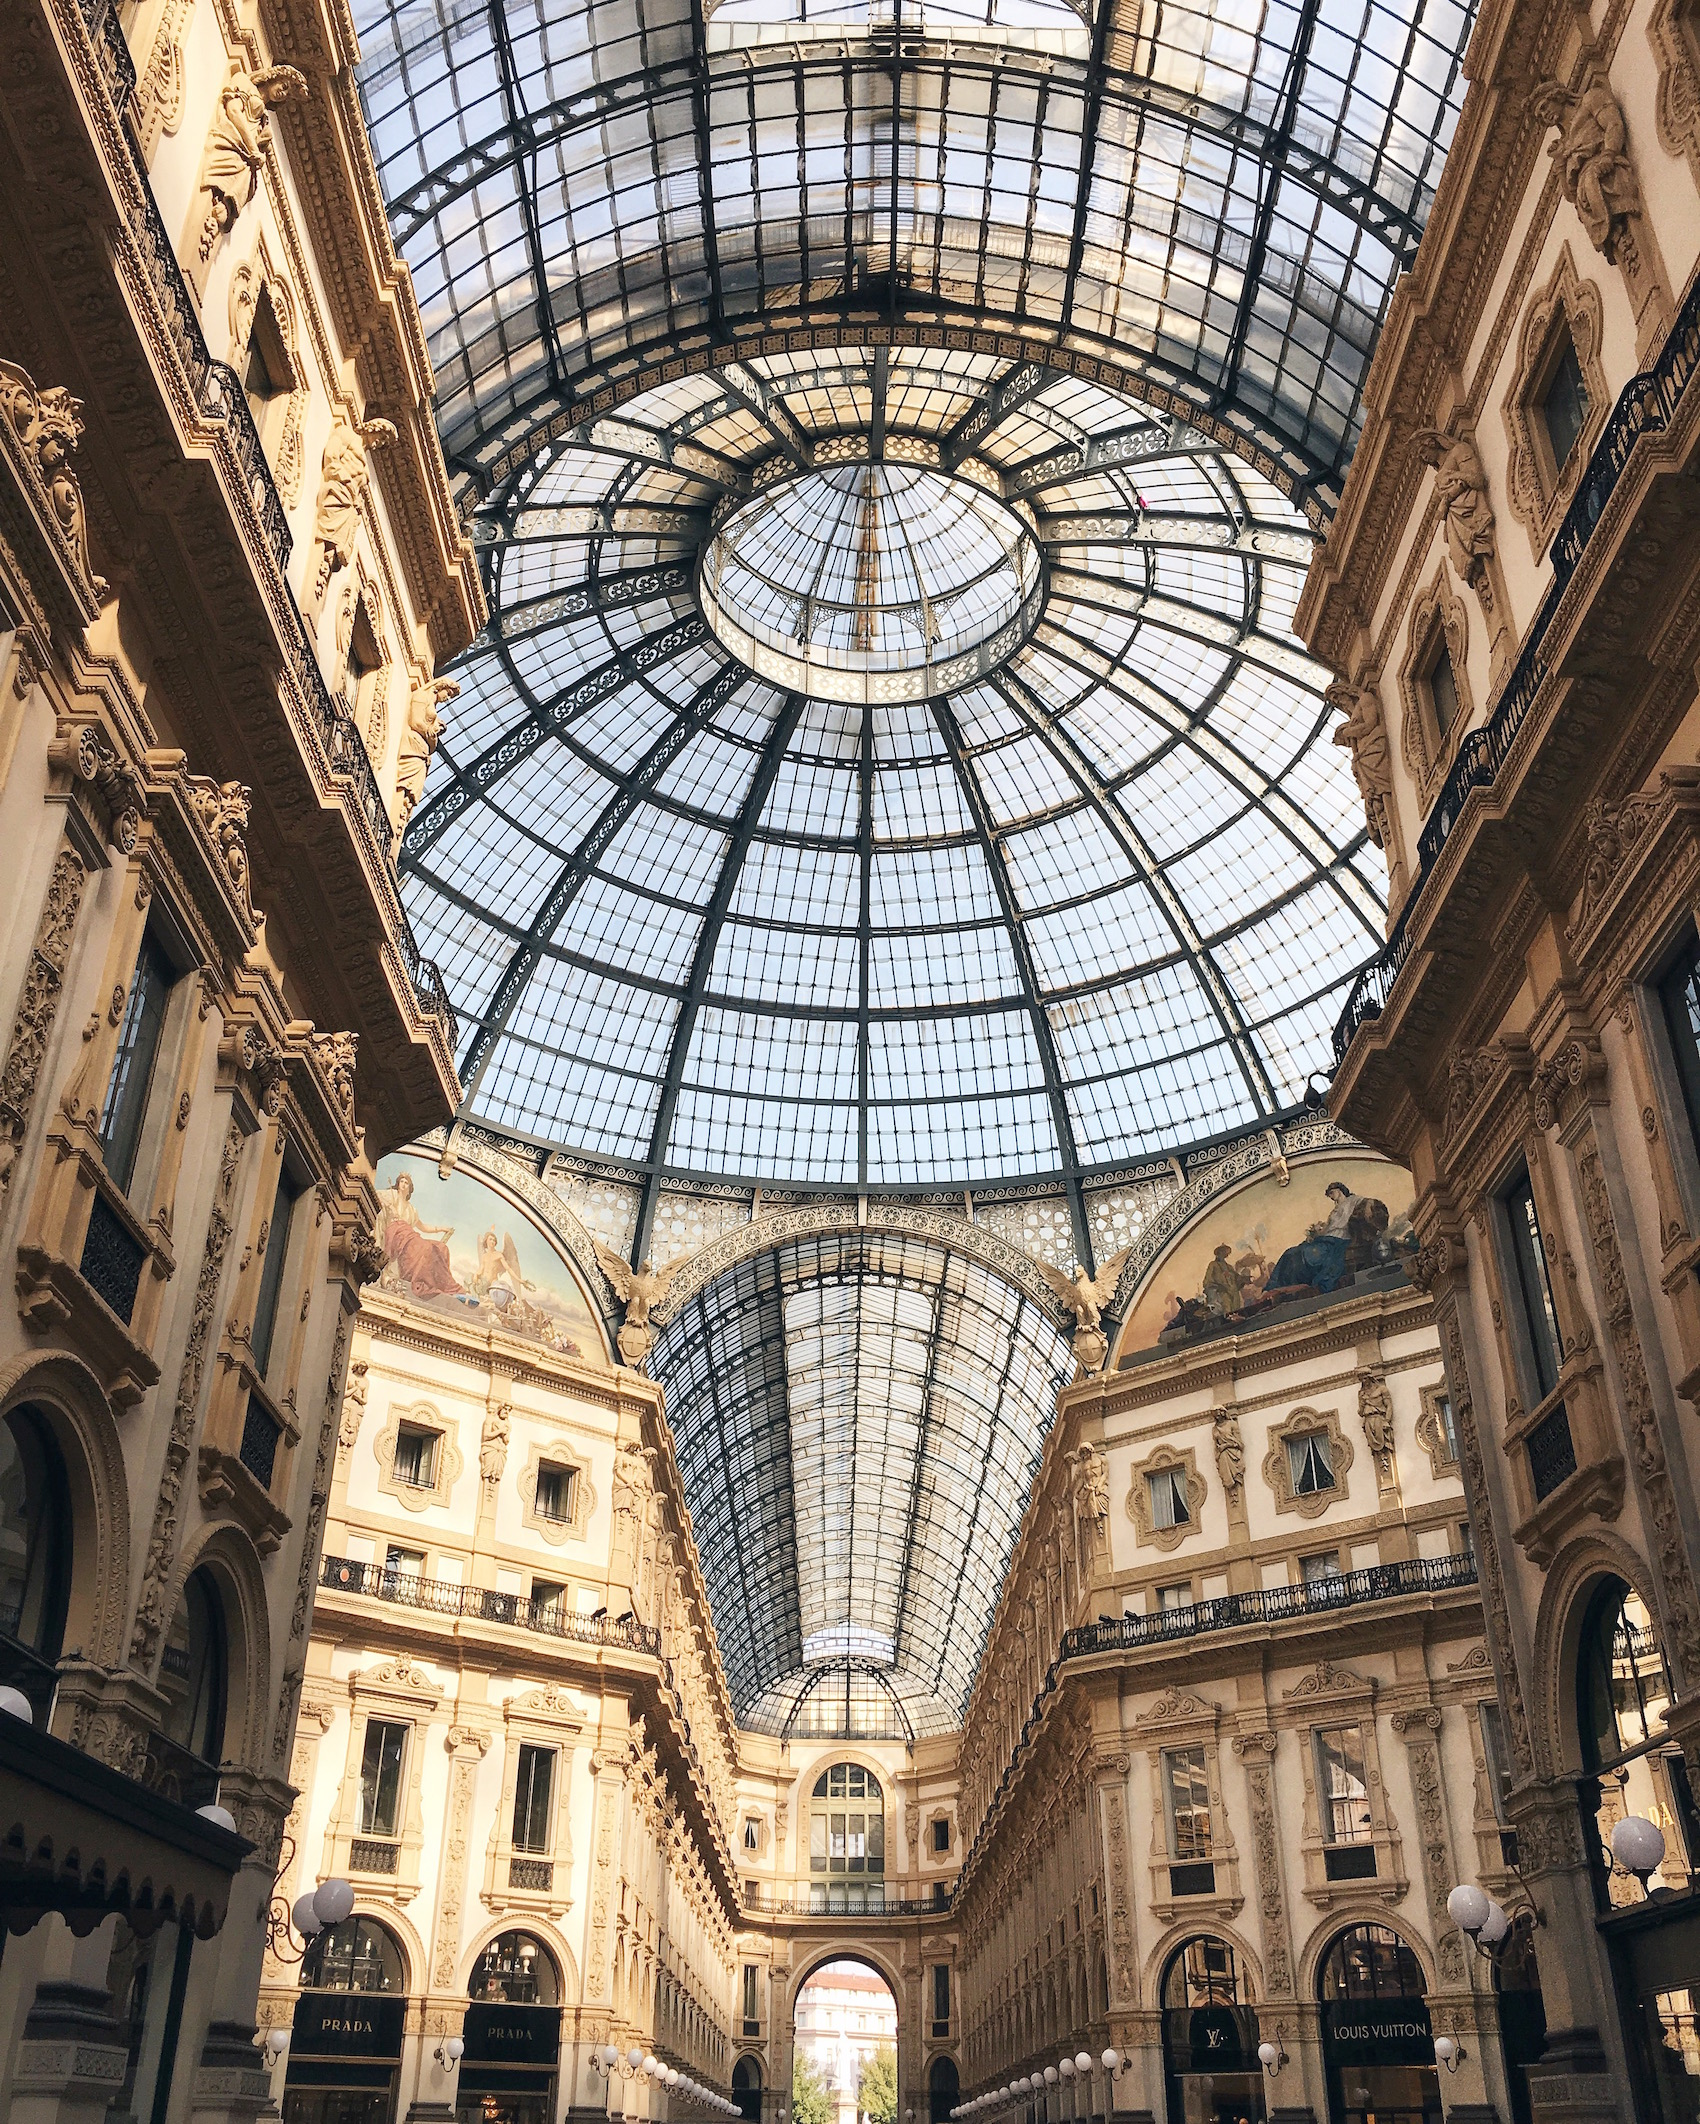 suelovesnyc_travel_reise_mailand_sightseeing_galleria_vittorio_emanuele_milan